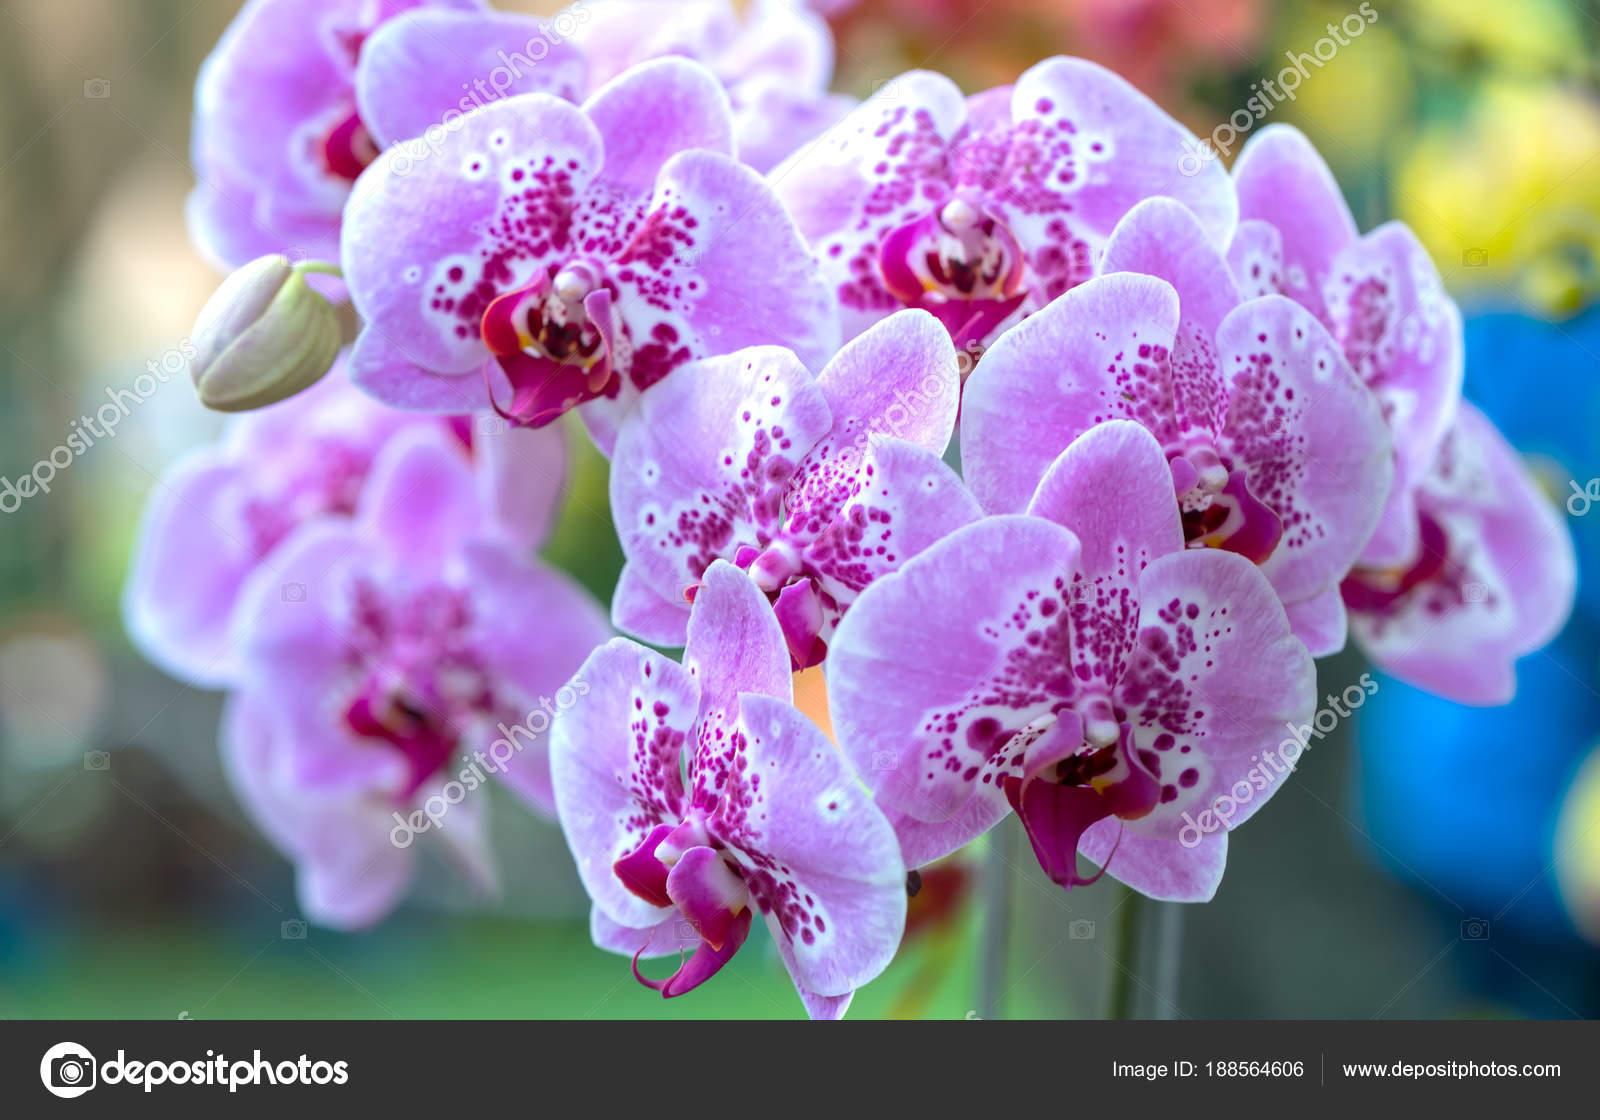 Phalaenopsis Flowers Bloom Spring Adorn Beauty Nature Most Beautiful